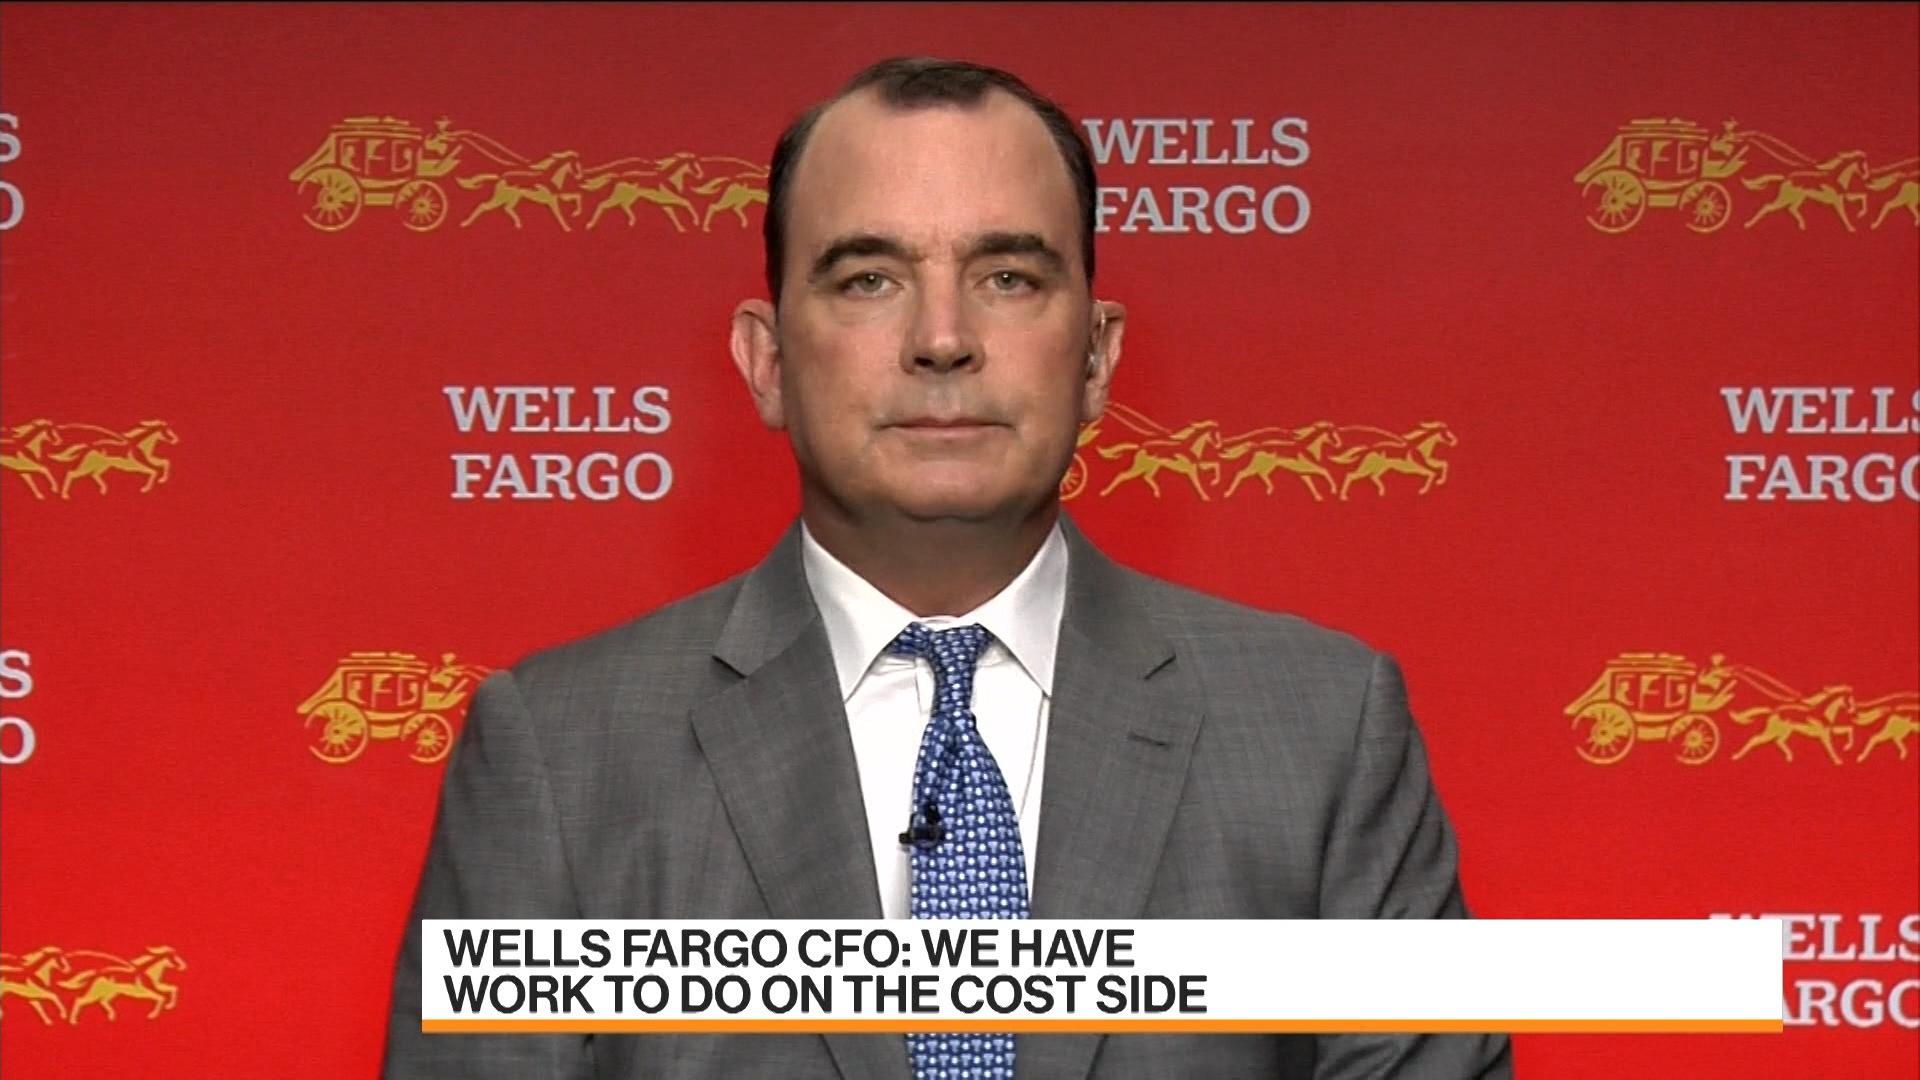 Wells Fargo Has Work to Do on Cost Side: CFO John Shrewsberry